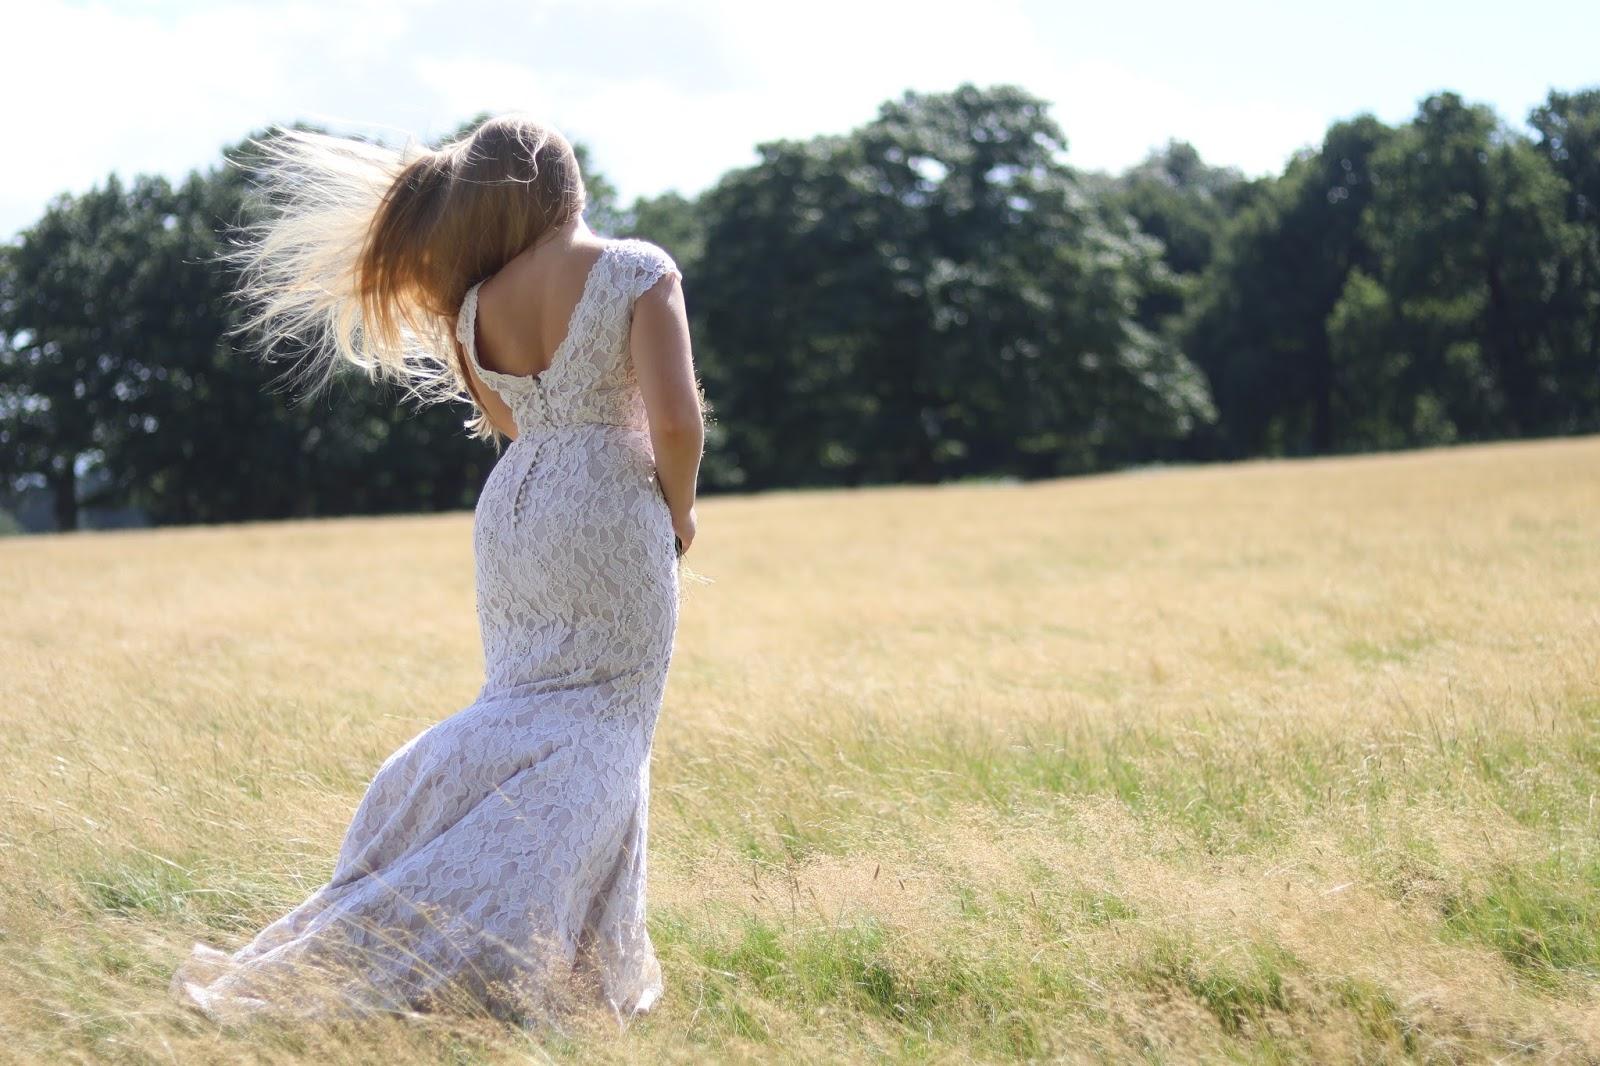 Katie Heath wearing a Jacques Vert Wedding Dress in Richmond Park Meadow